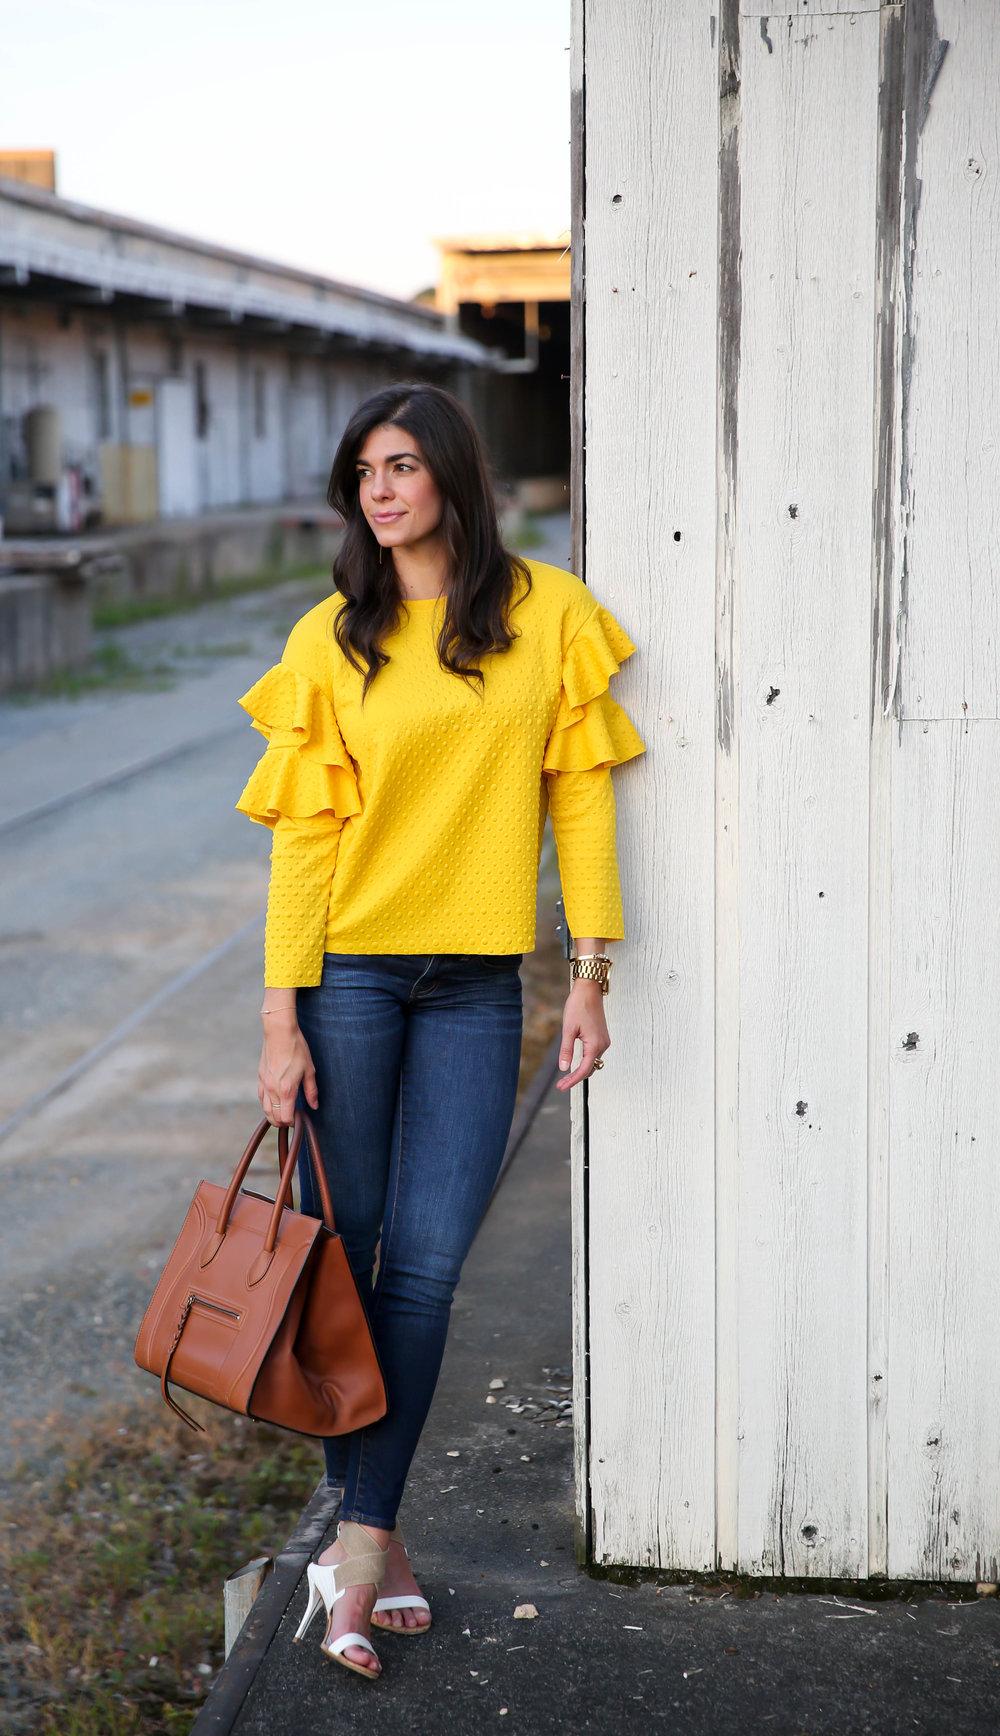 street-style-inspiration-ruffle-blouse-dark-denim-lauren-schwaiger-blog.jpg